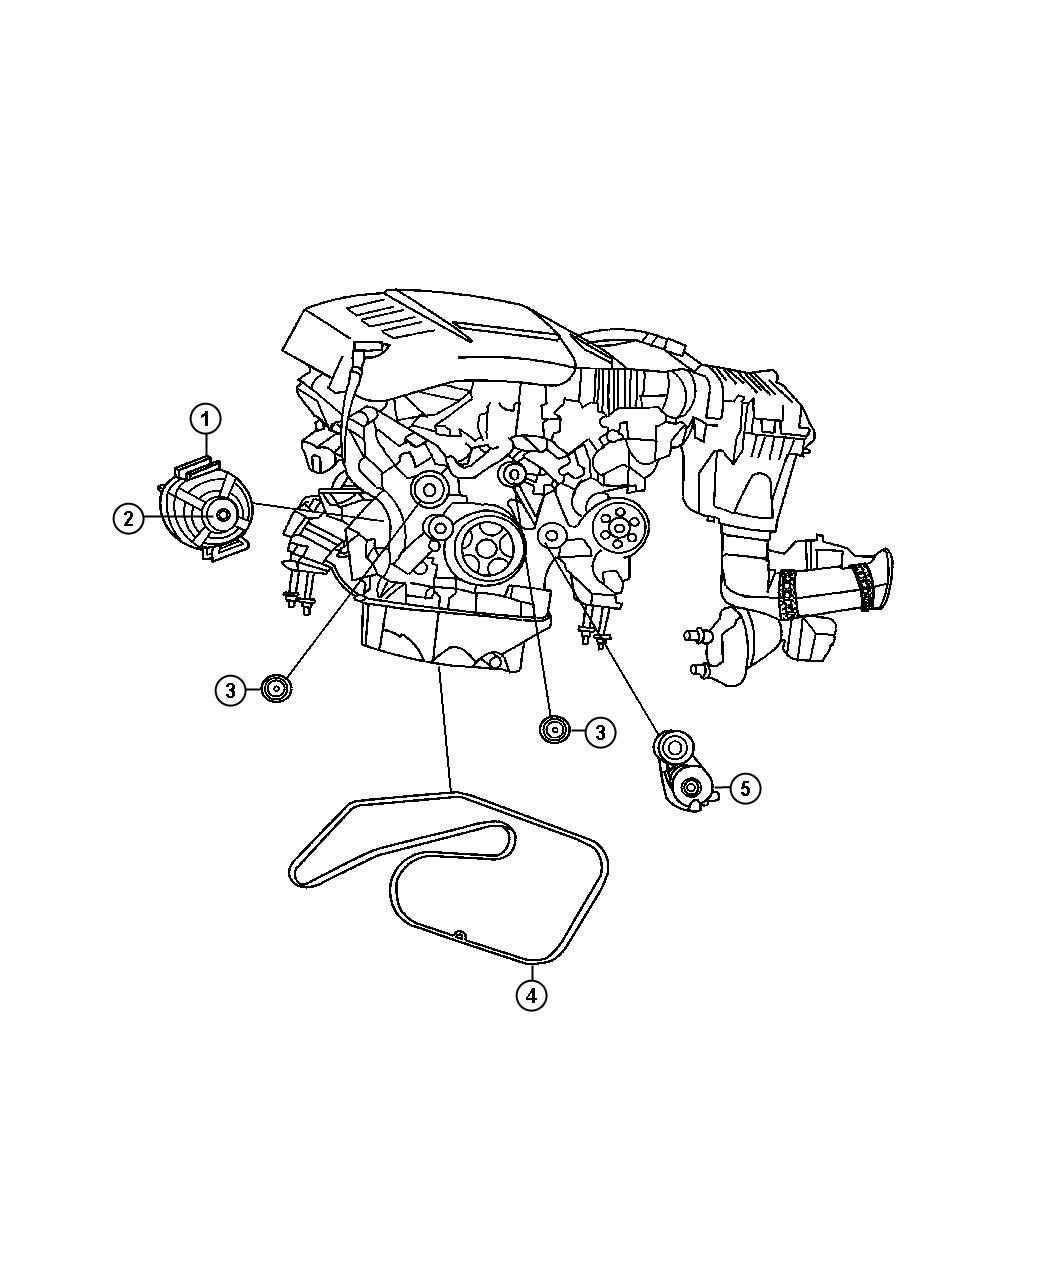 Dodge Sprinter Pulley Alternator Relatedsel